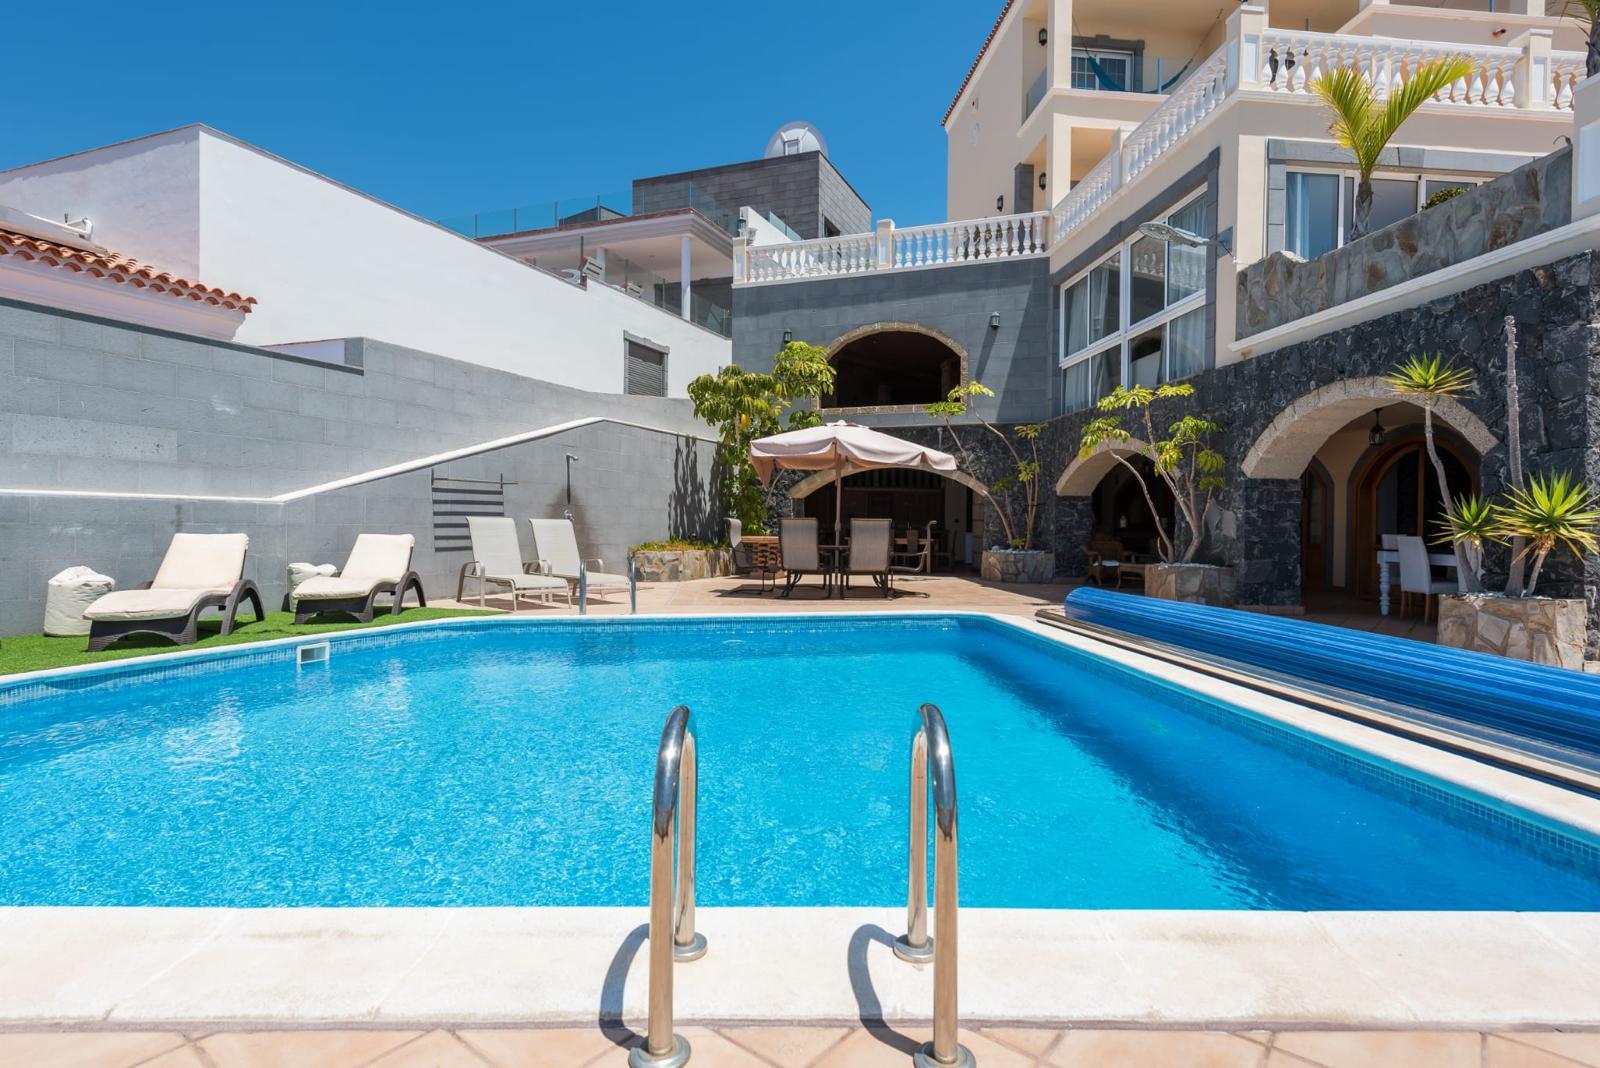 Mansion in Spain